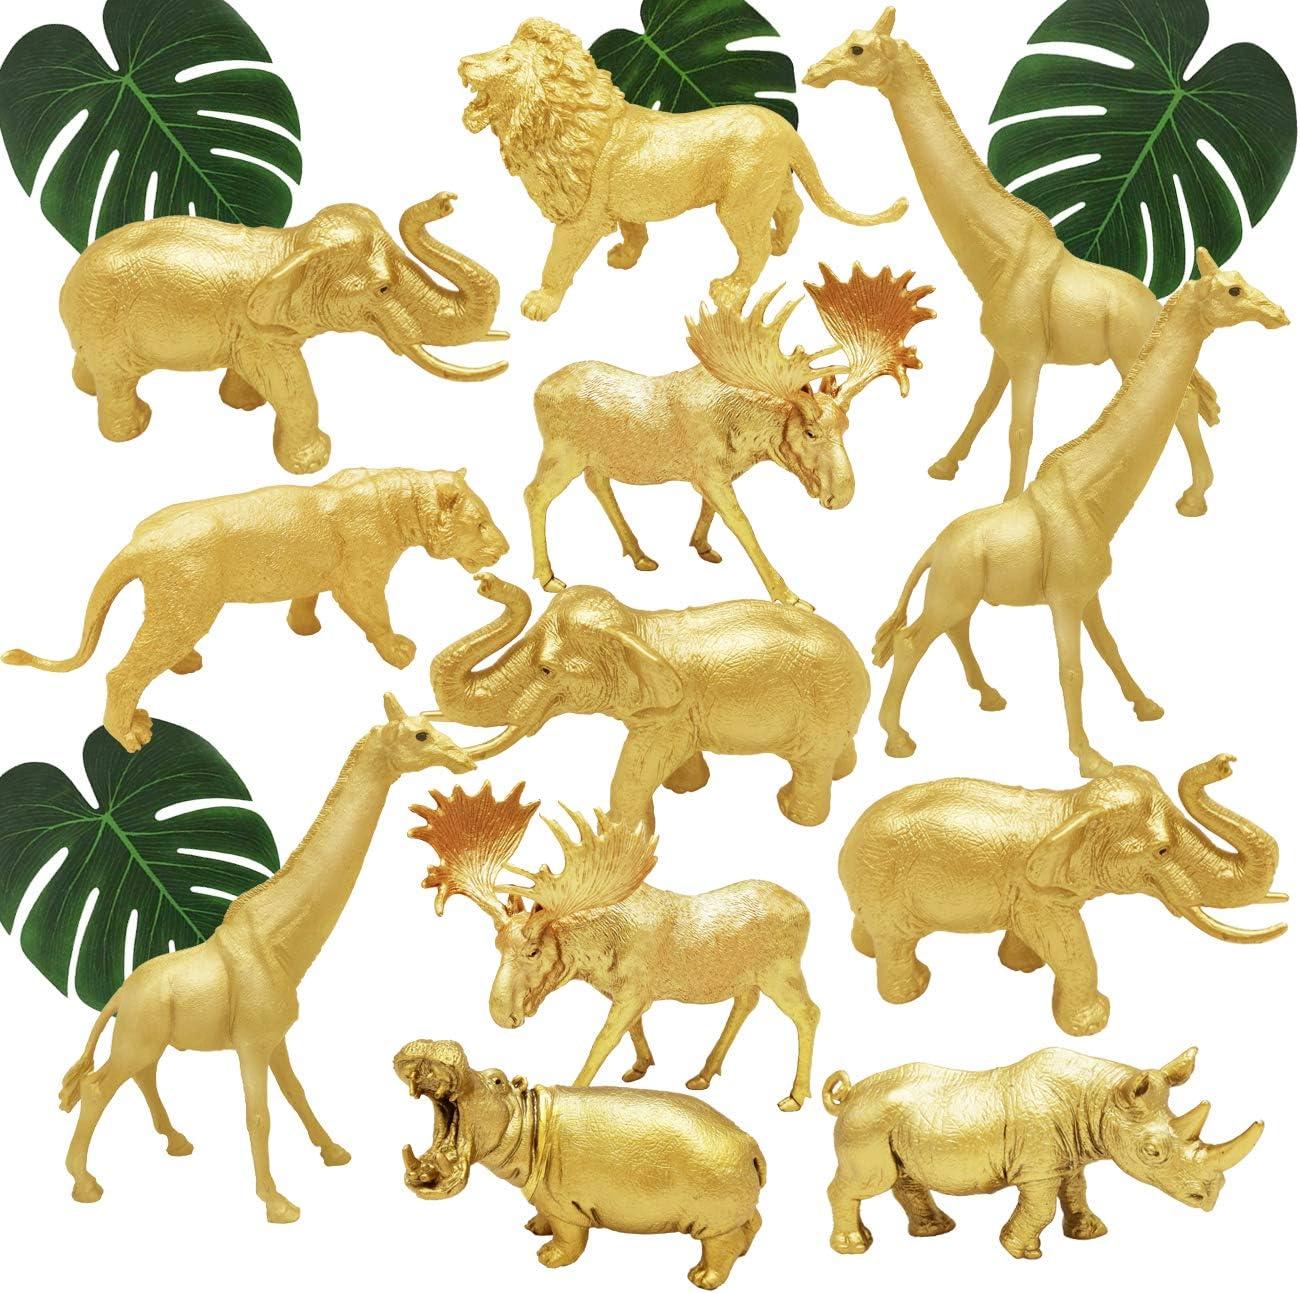 BOLZRA Metallic Gold Plastic Animal Figurines Toys, 12PCS Jumbo Safari Zoo Animal Figures, Jungle Wild Animals with Elephant, Lion, Giraffe for Baby Shower Decor, Safari Themed Birthday Party